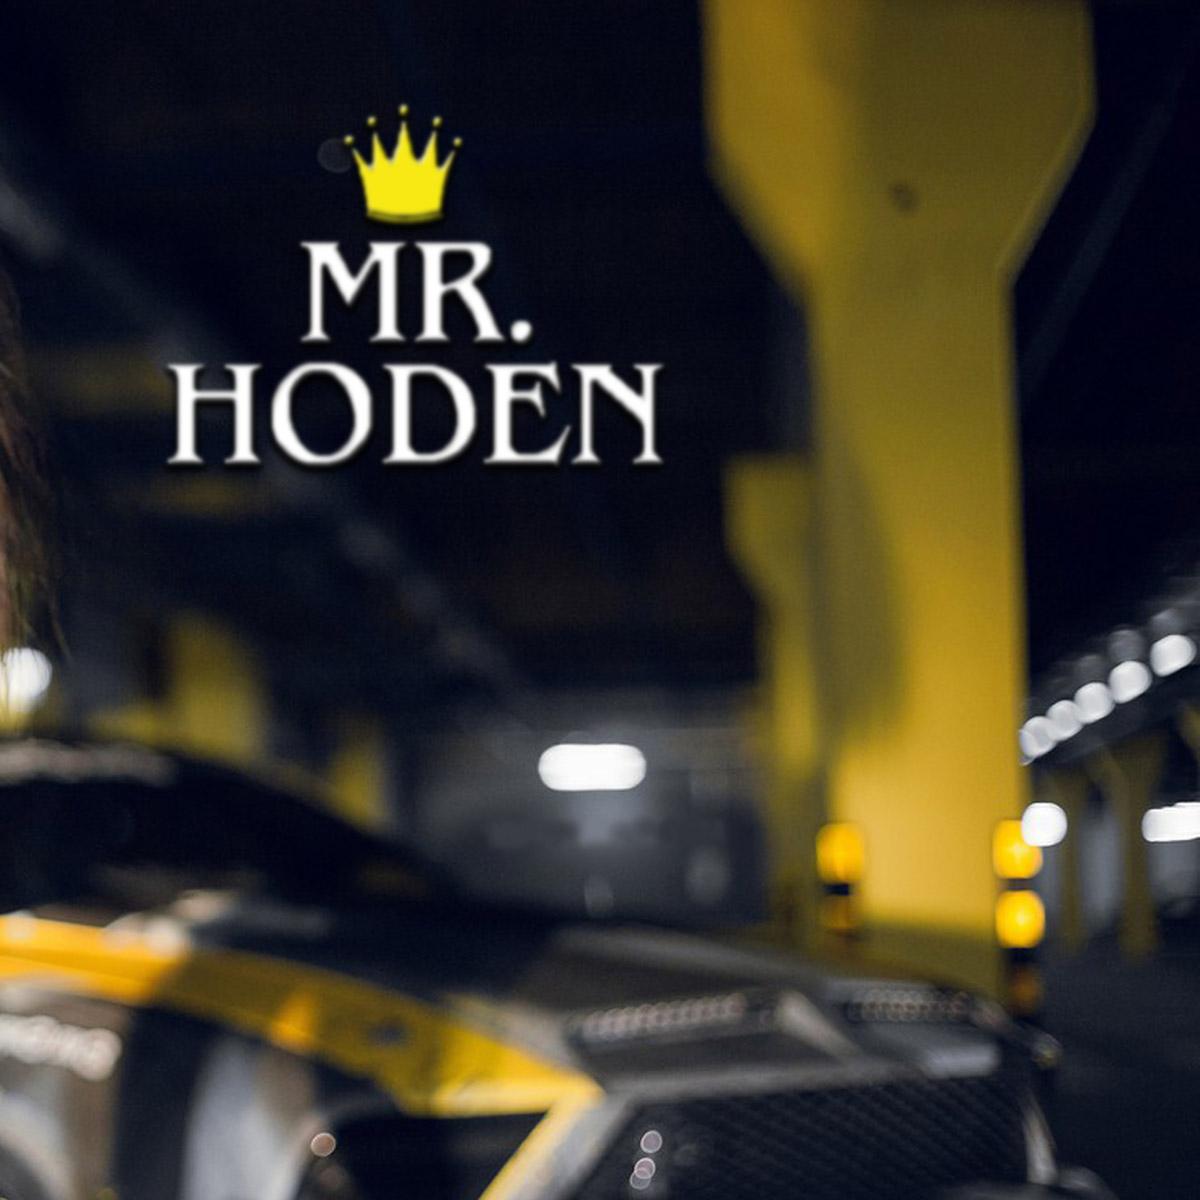 Upcoming: Mr. Hoden - Hard Banger Trap Beat 2020 [FREE BEAT]